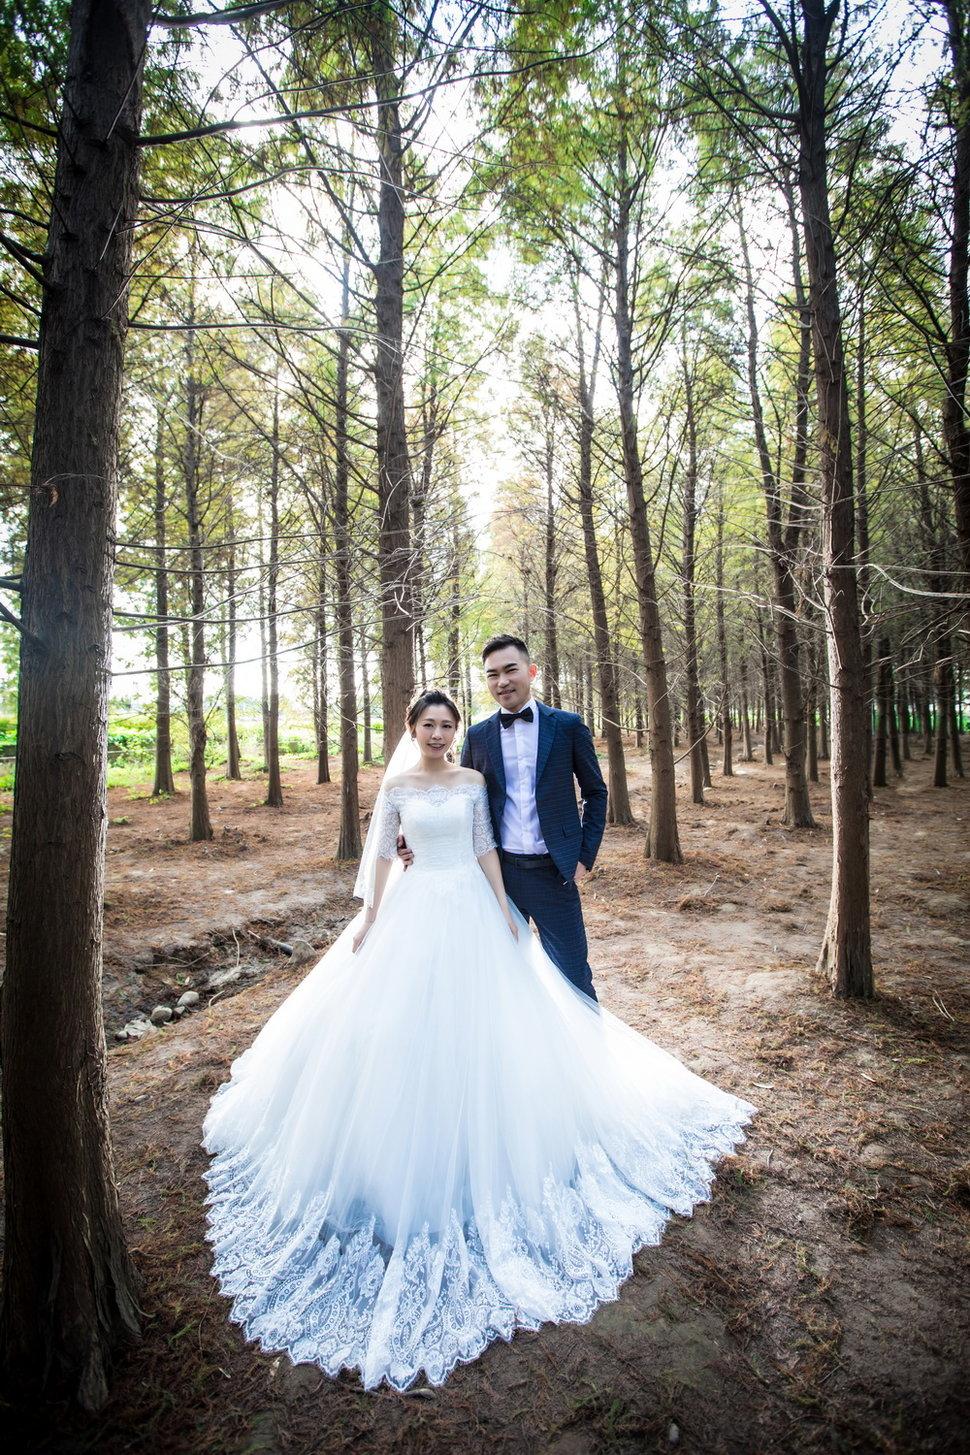 IMG_8780-2 - 春之嫁衣精緻婚紗 - 結婚吧